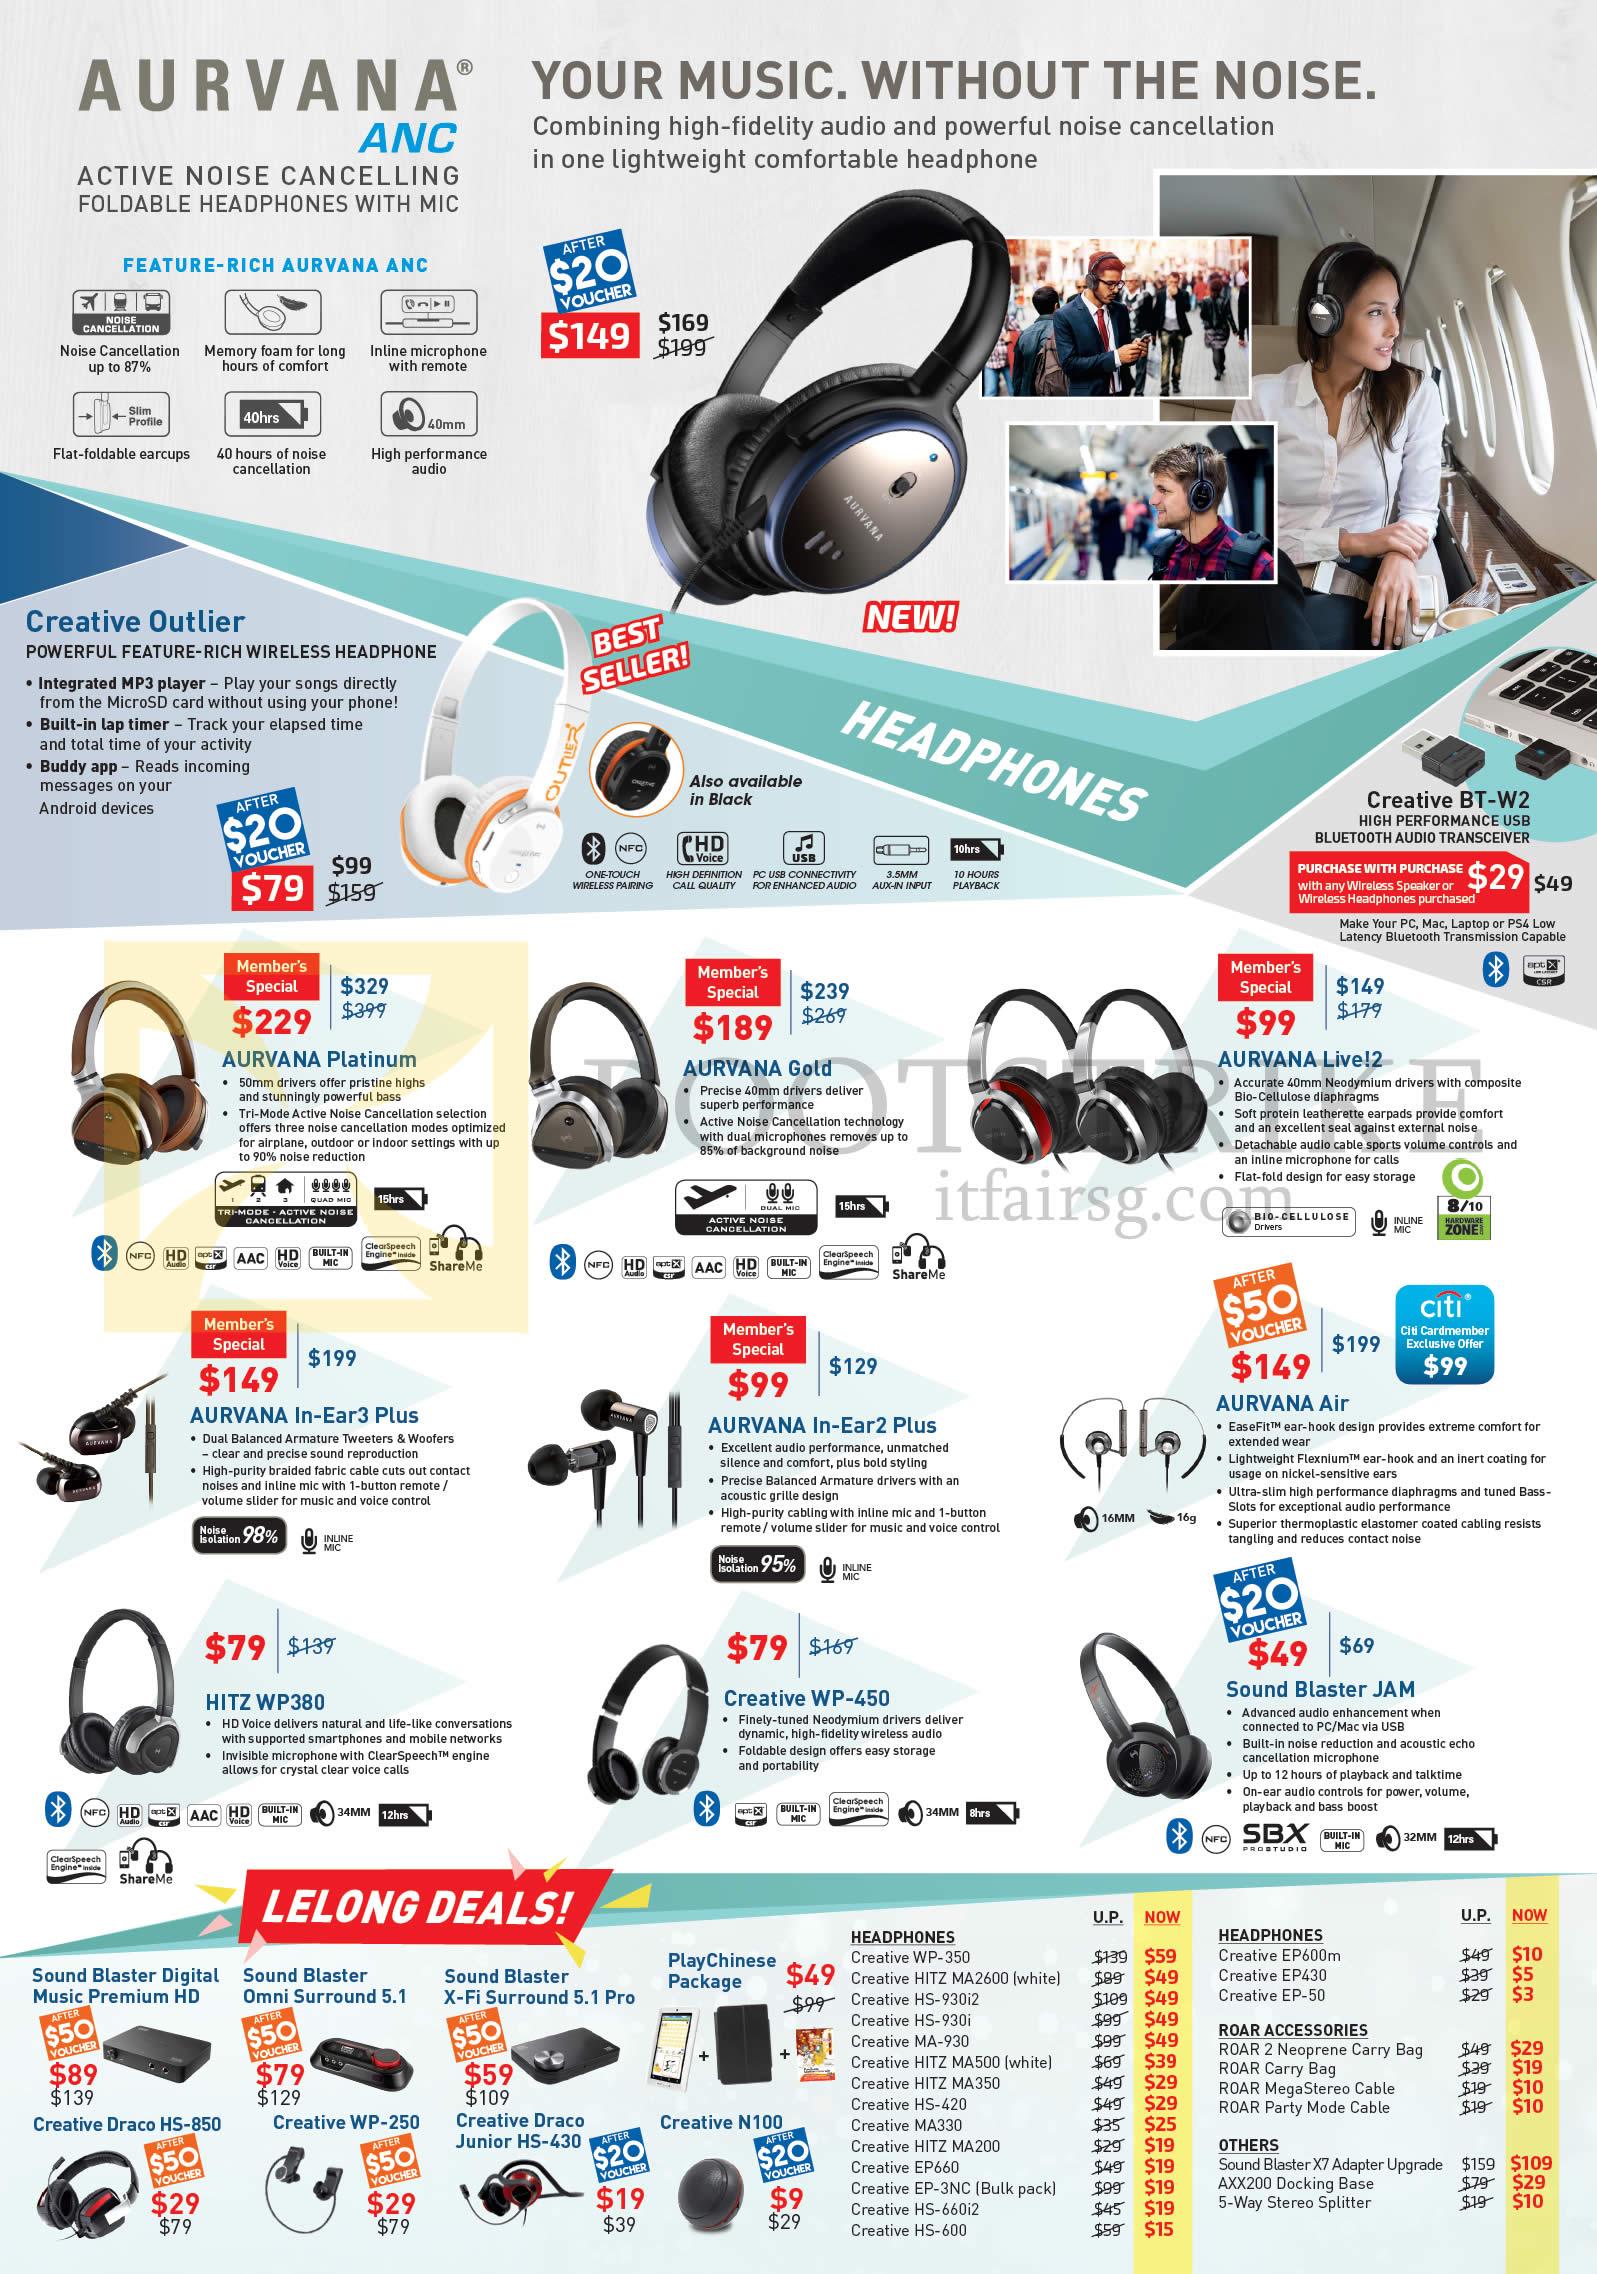 Creative aurvana live headphones review uk dating 6